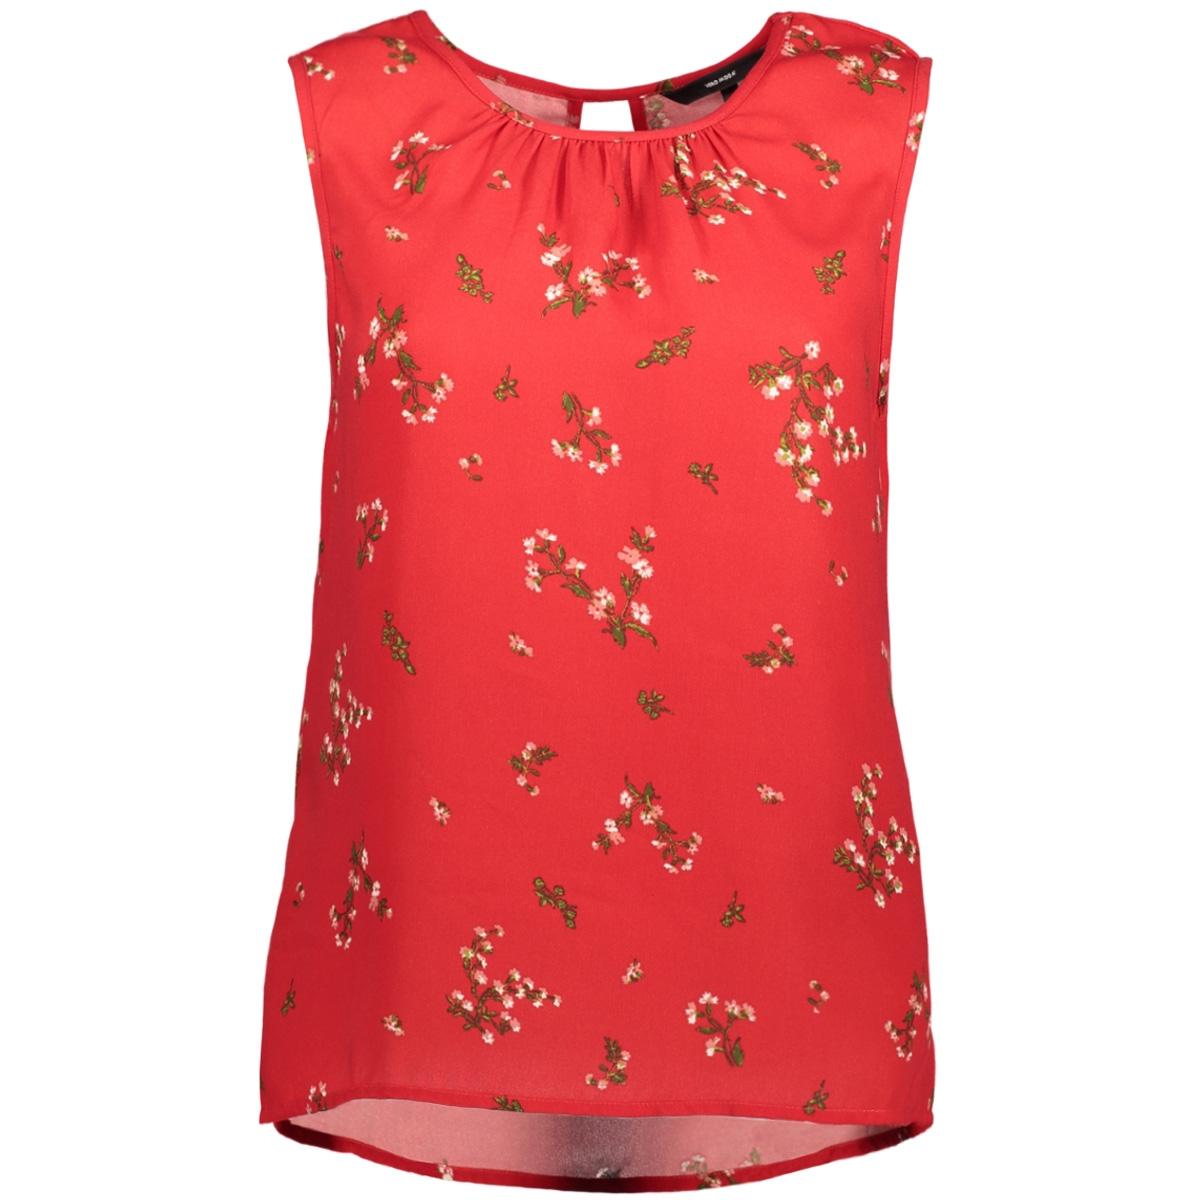 vmparisan s/l top d2-8 10189801 vero moda top lychee/flora prin